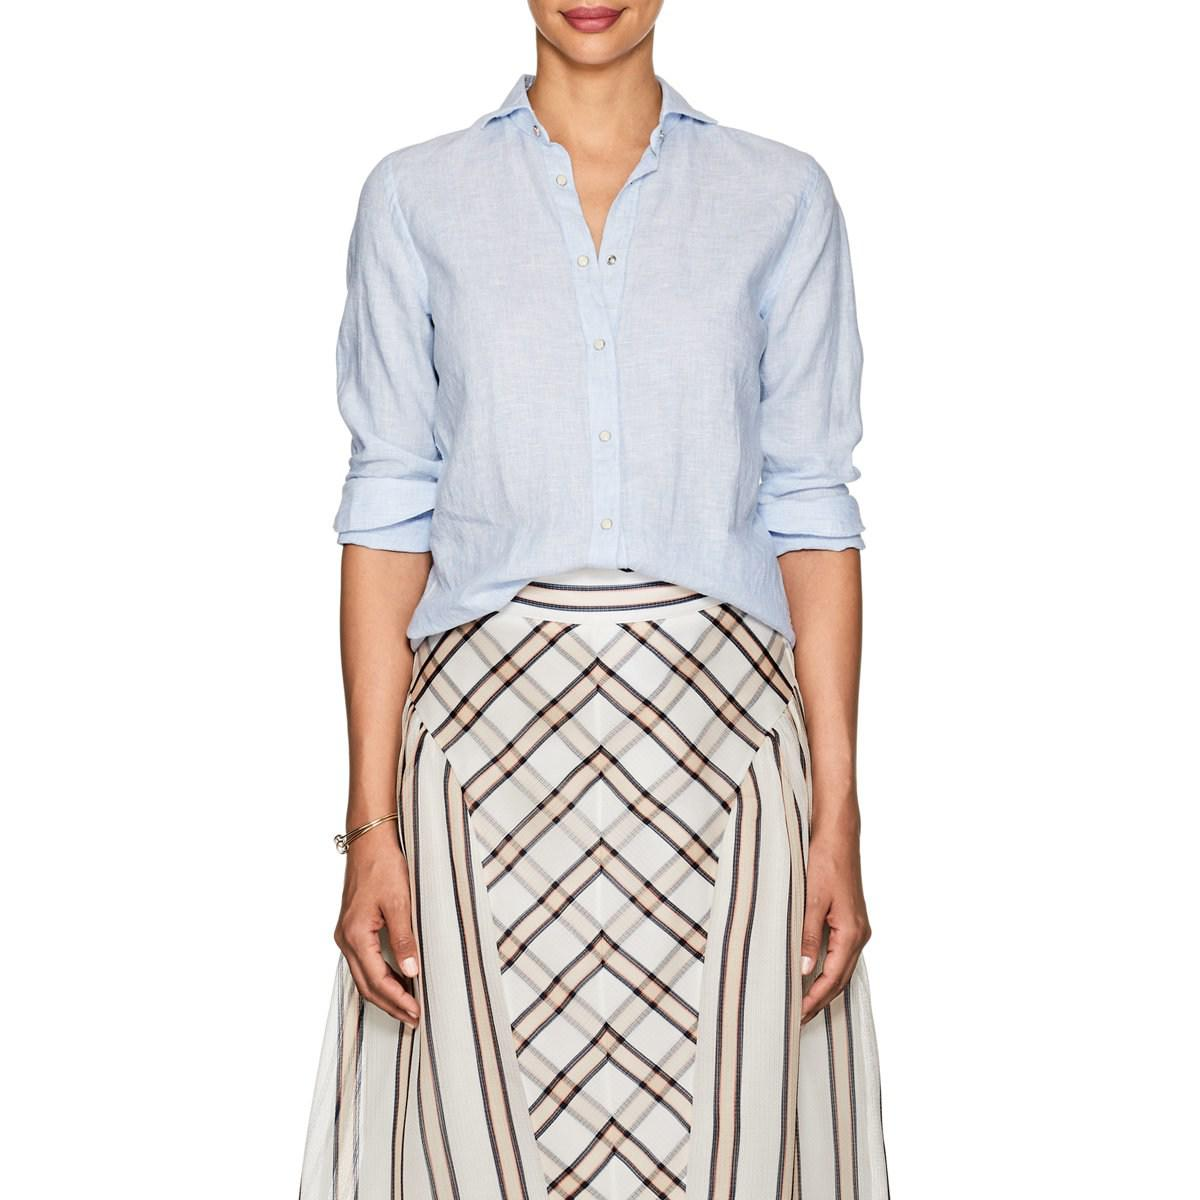 Buy Cheap Genuine Womens Linen Western Shirt Barneys New York Cheap Official Site Shop Cheap Price Release Dates Sale Online ca3xVk